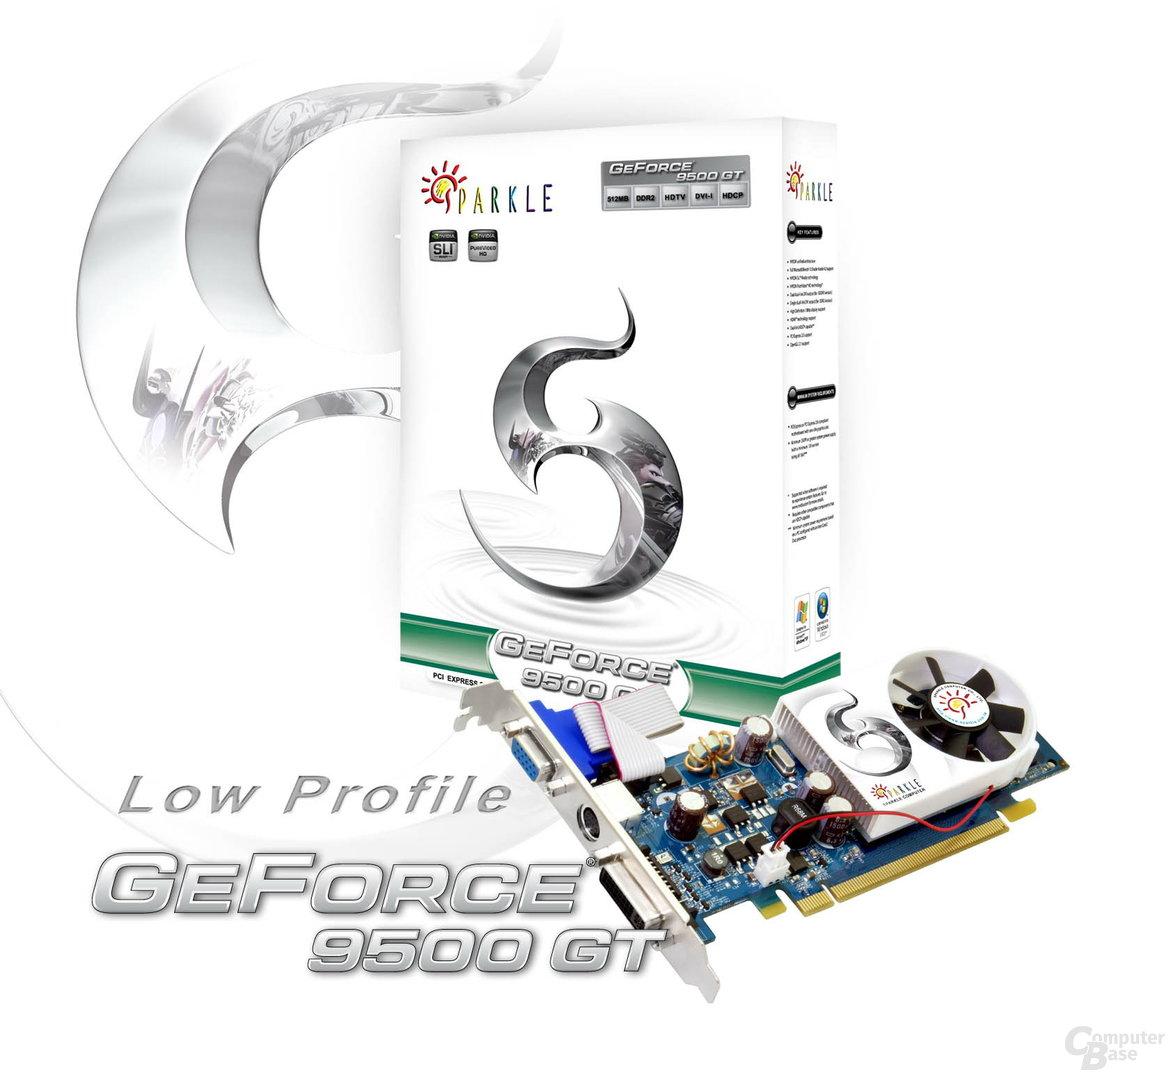 Sparkle GeForce 9500 GT Low Profile